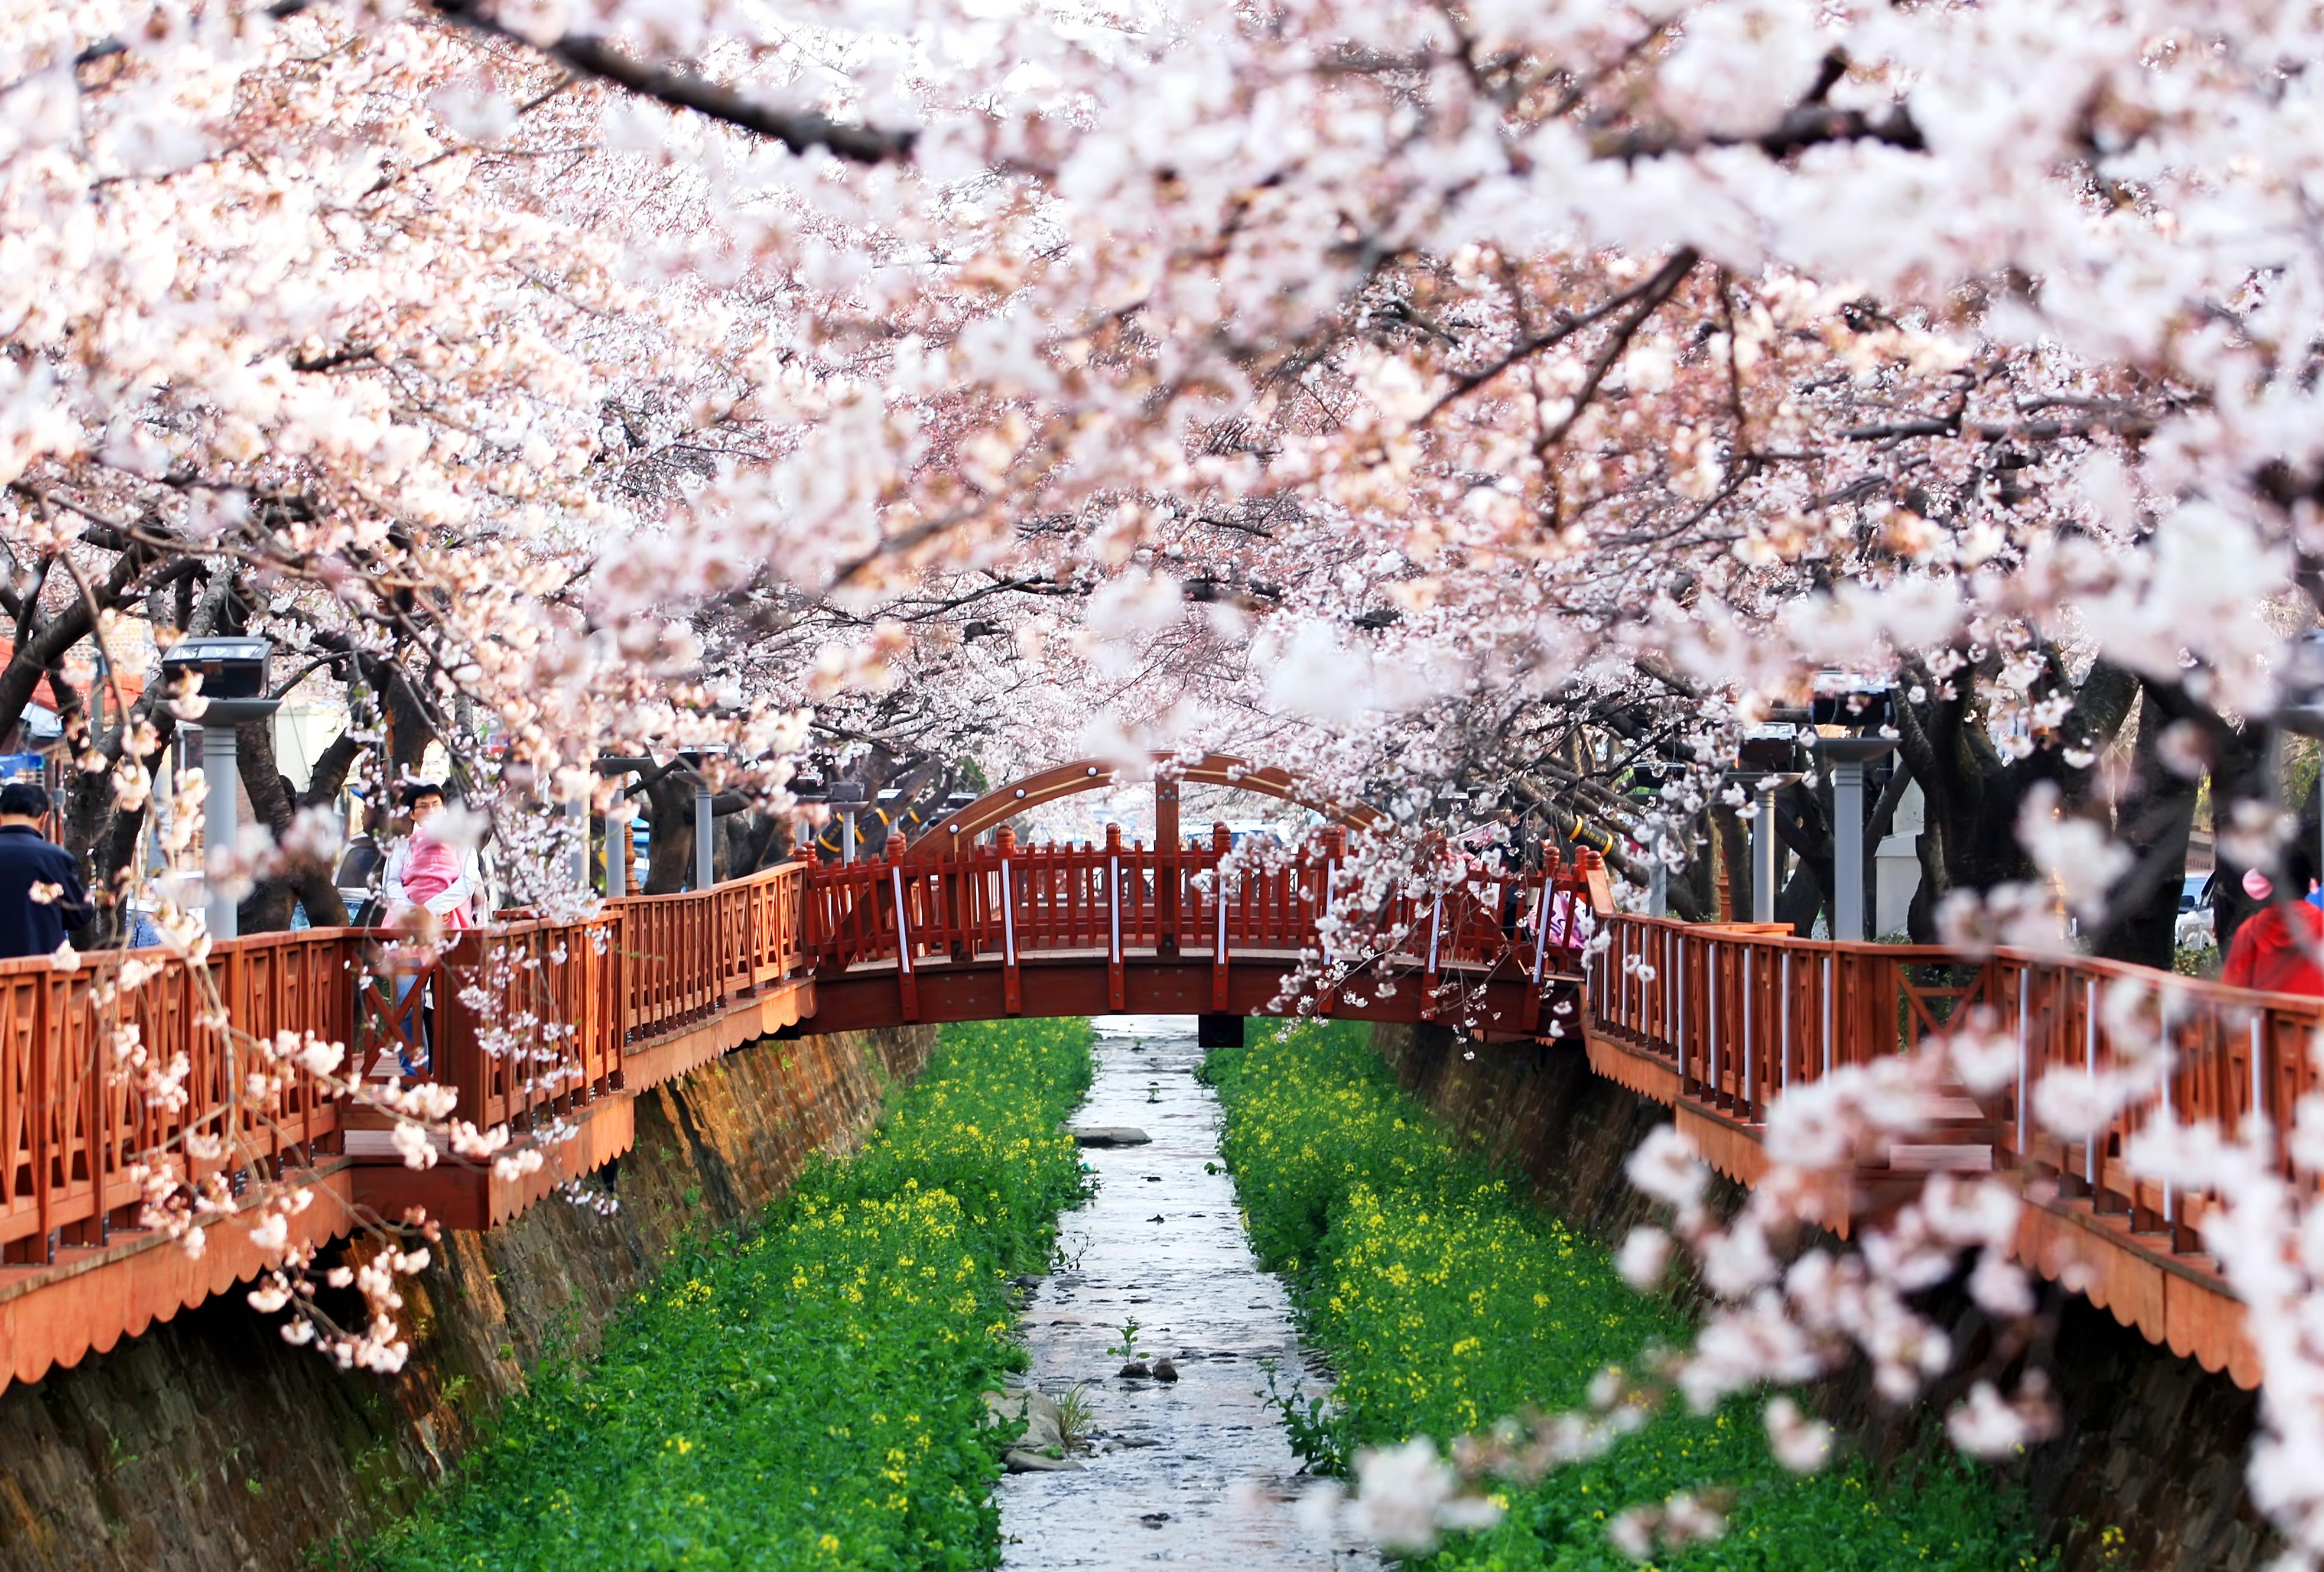 cherry blossom festival - HD3933×2660